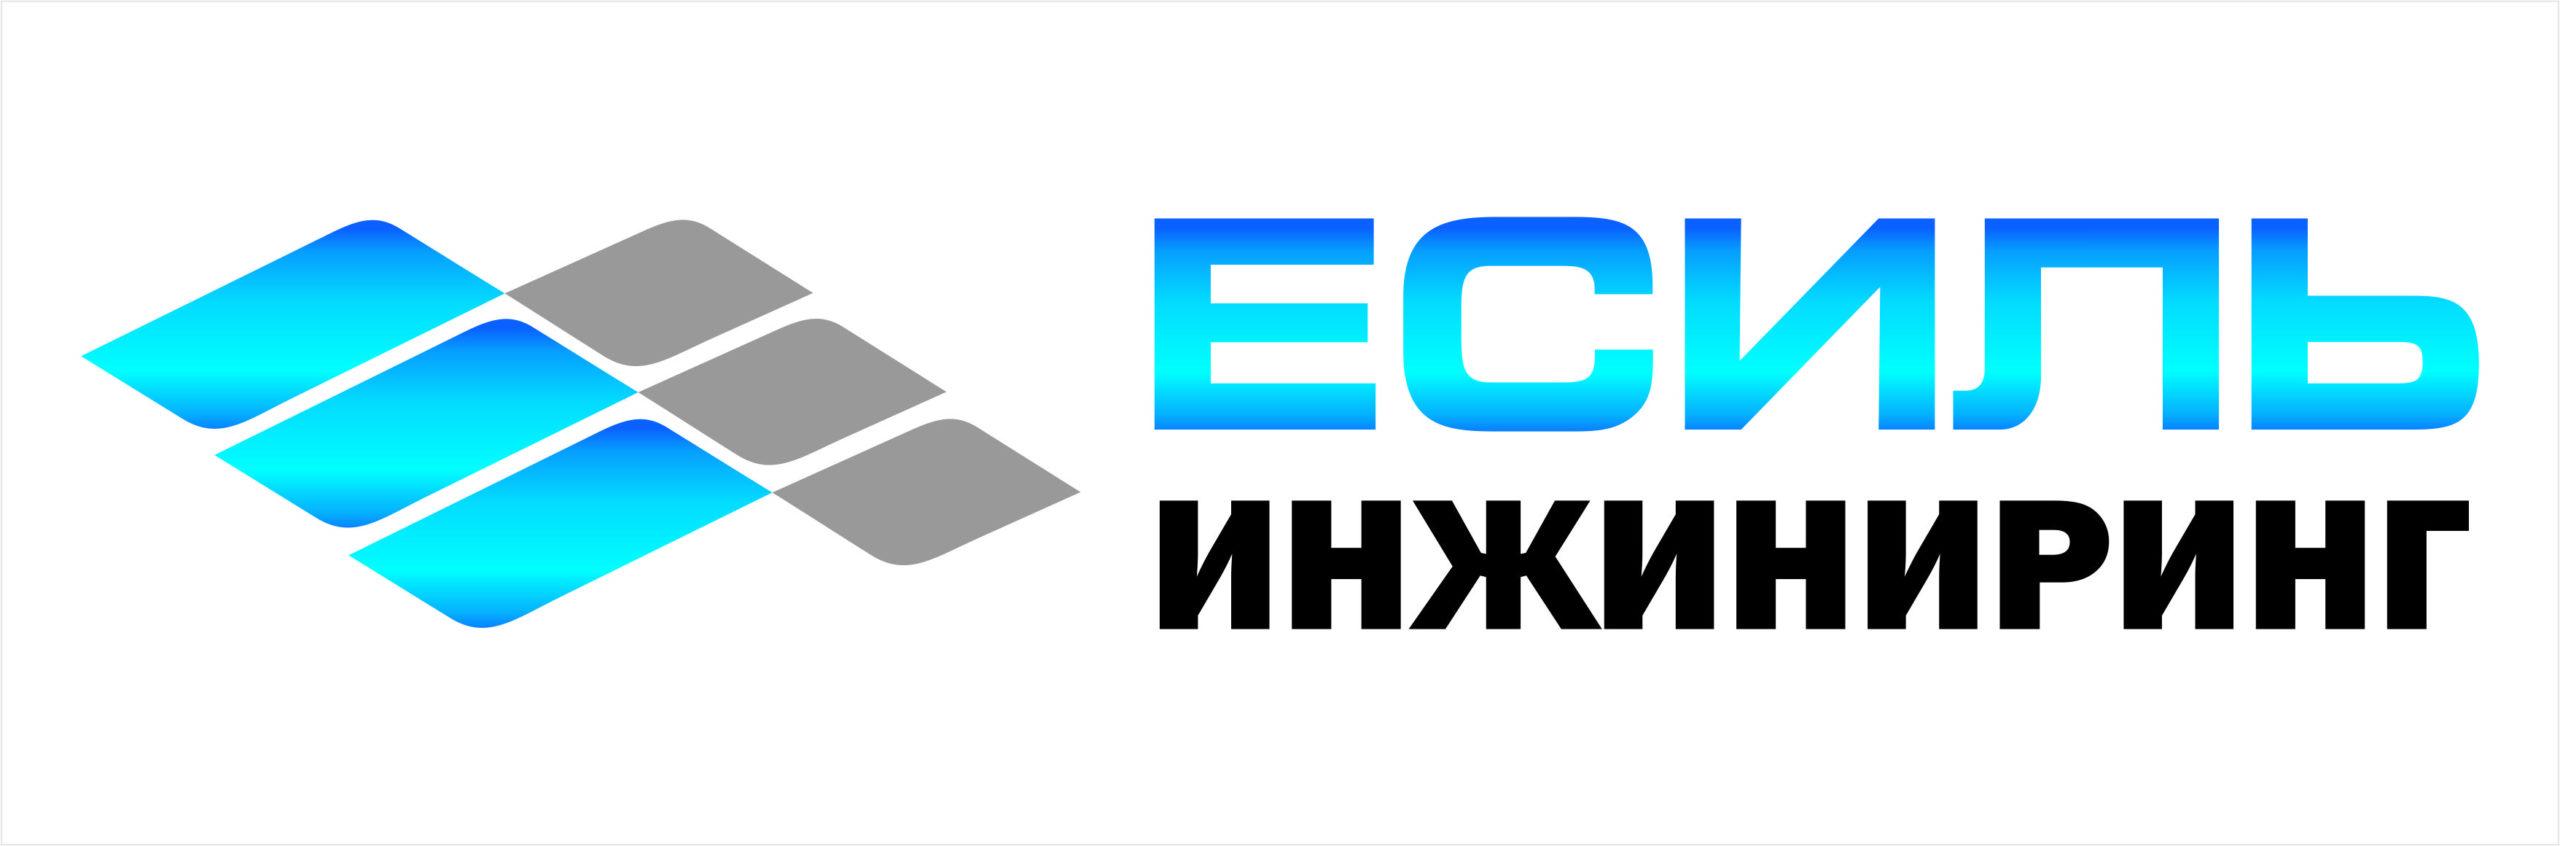 ЕСИЛЬ ИНЖИНИРИНГ-